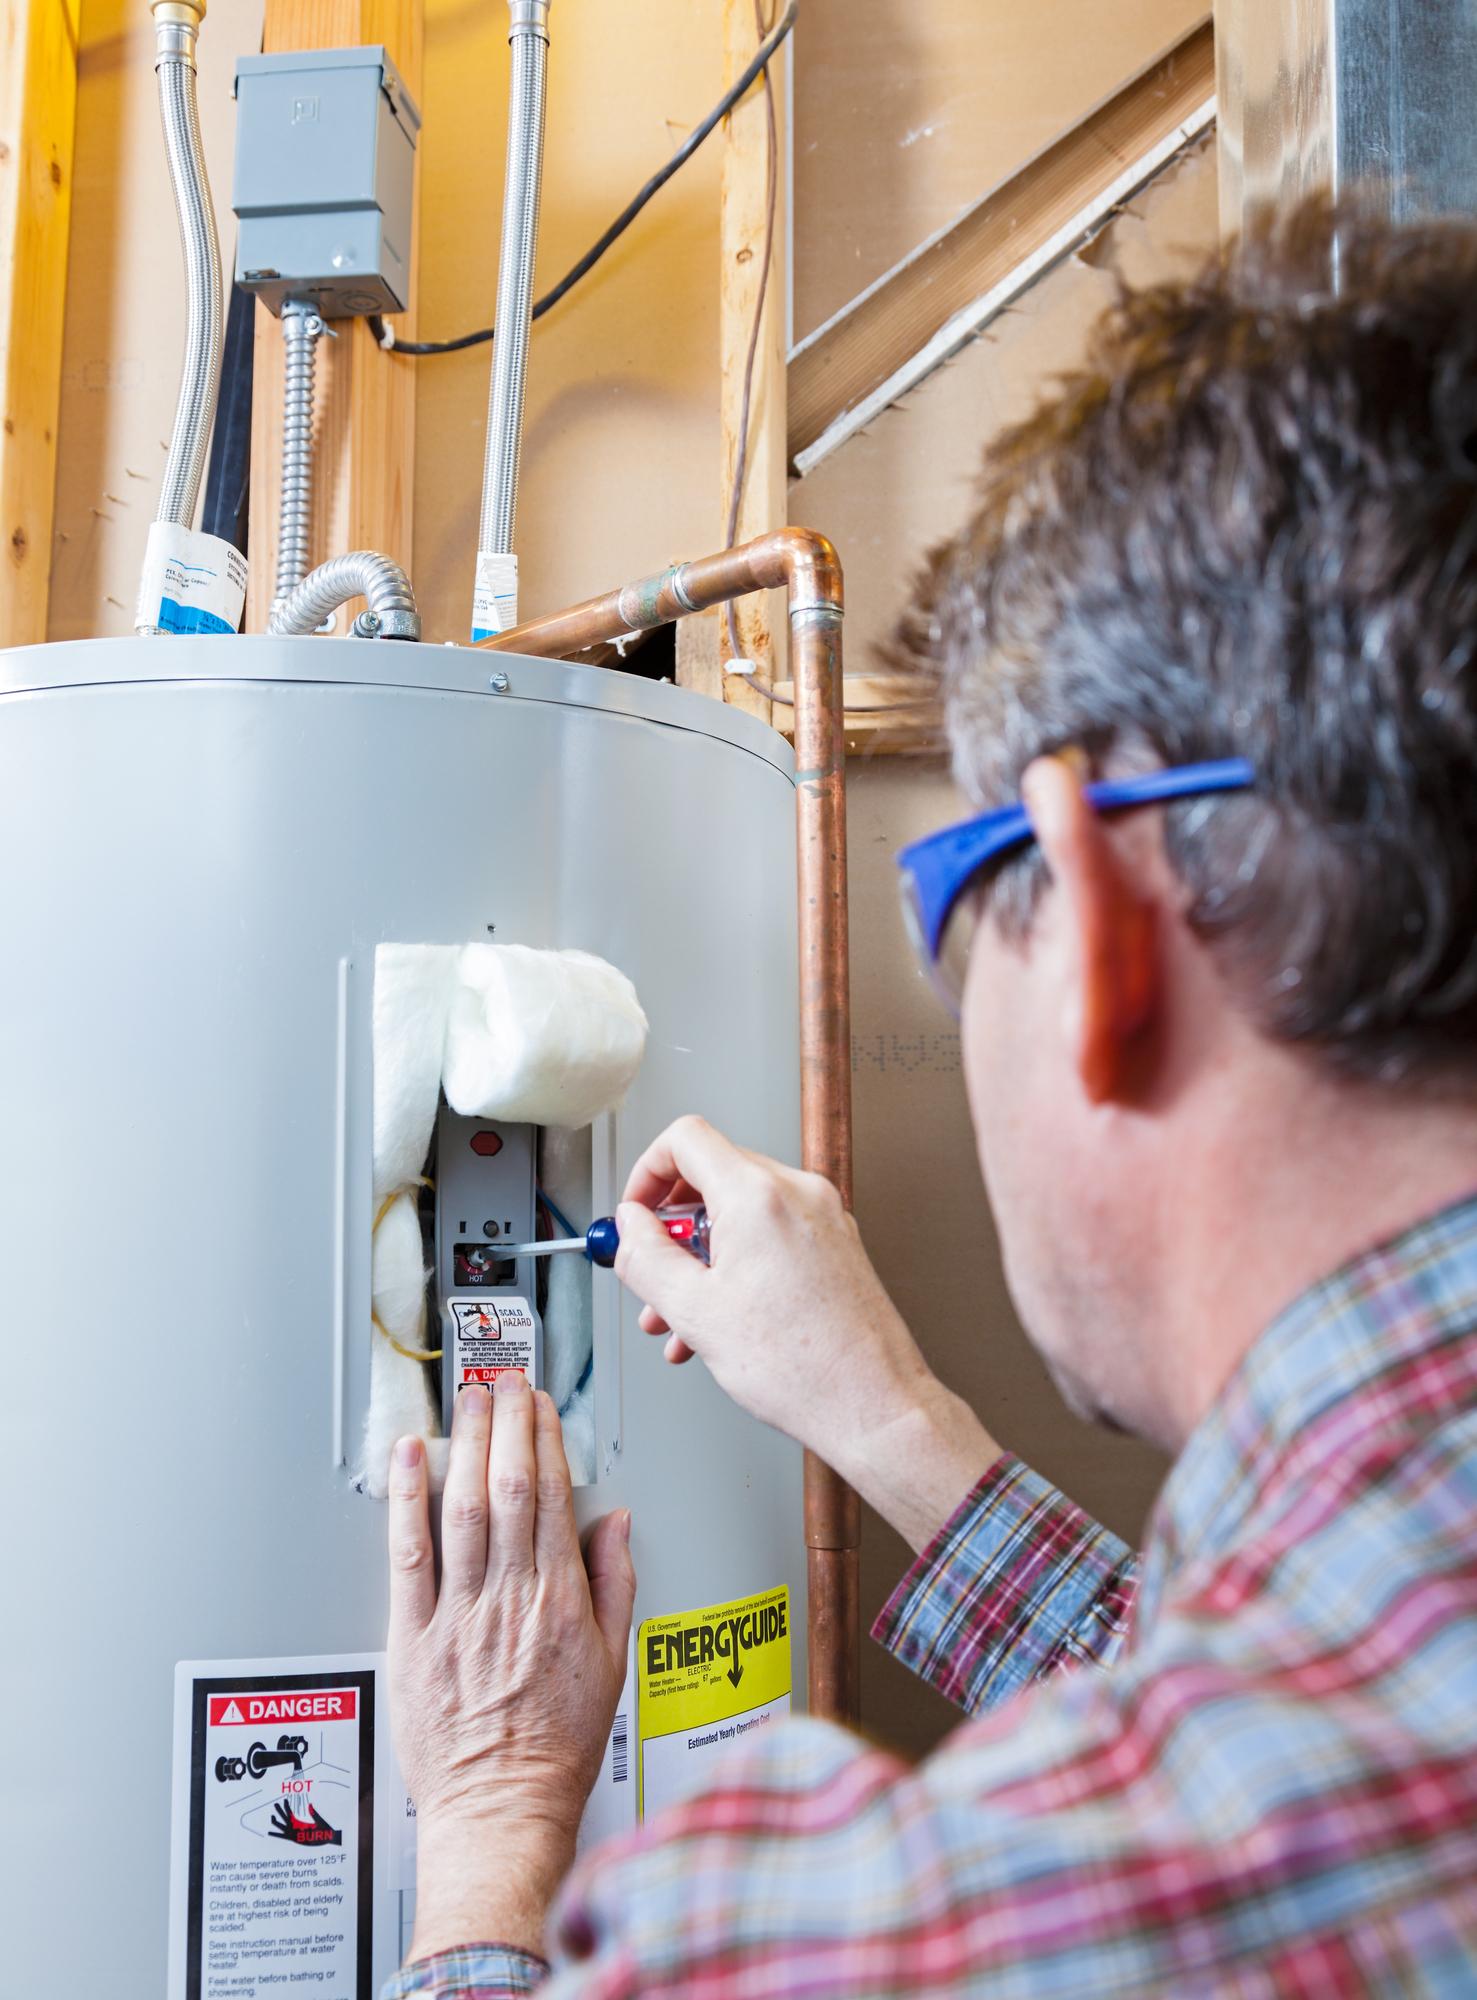 Reliance 606 water heater